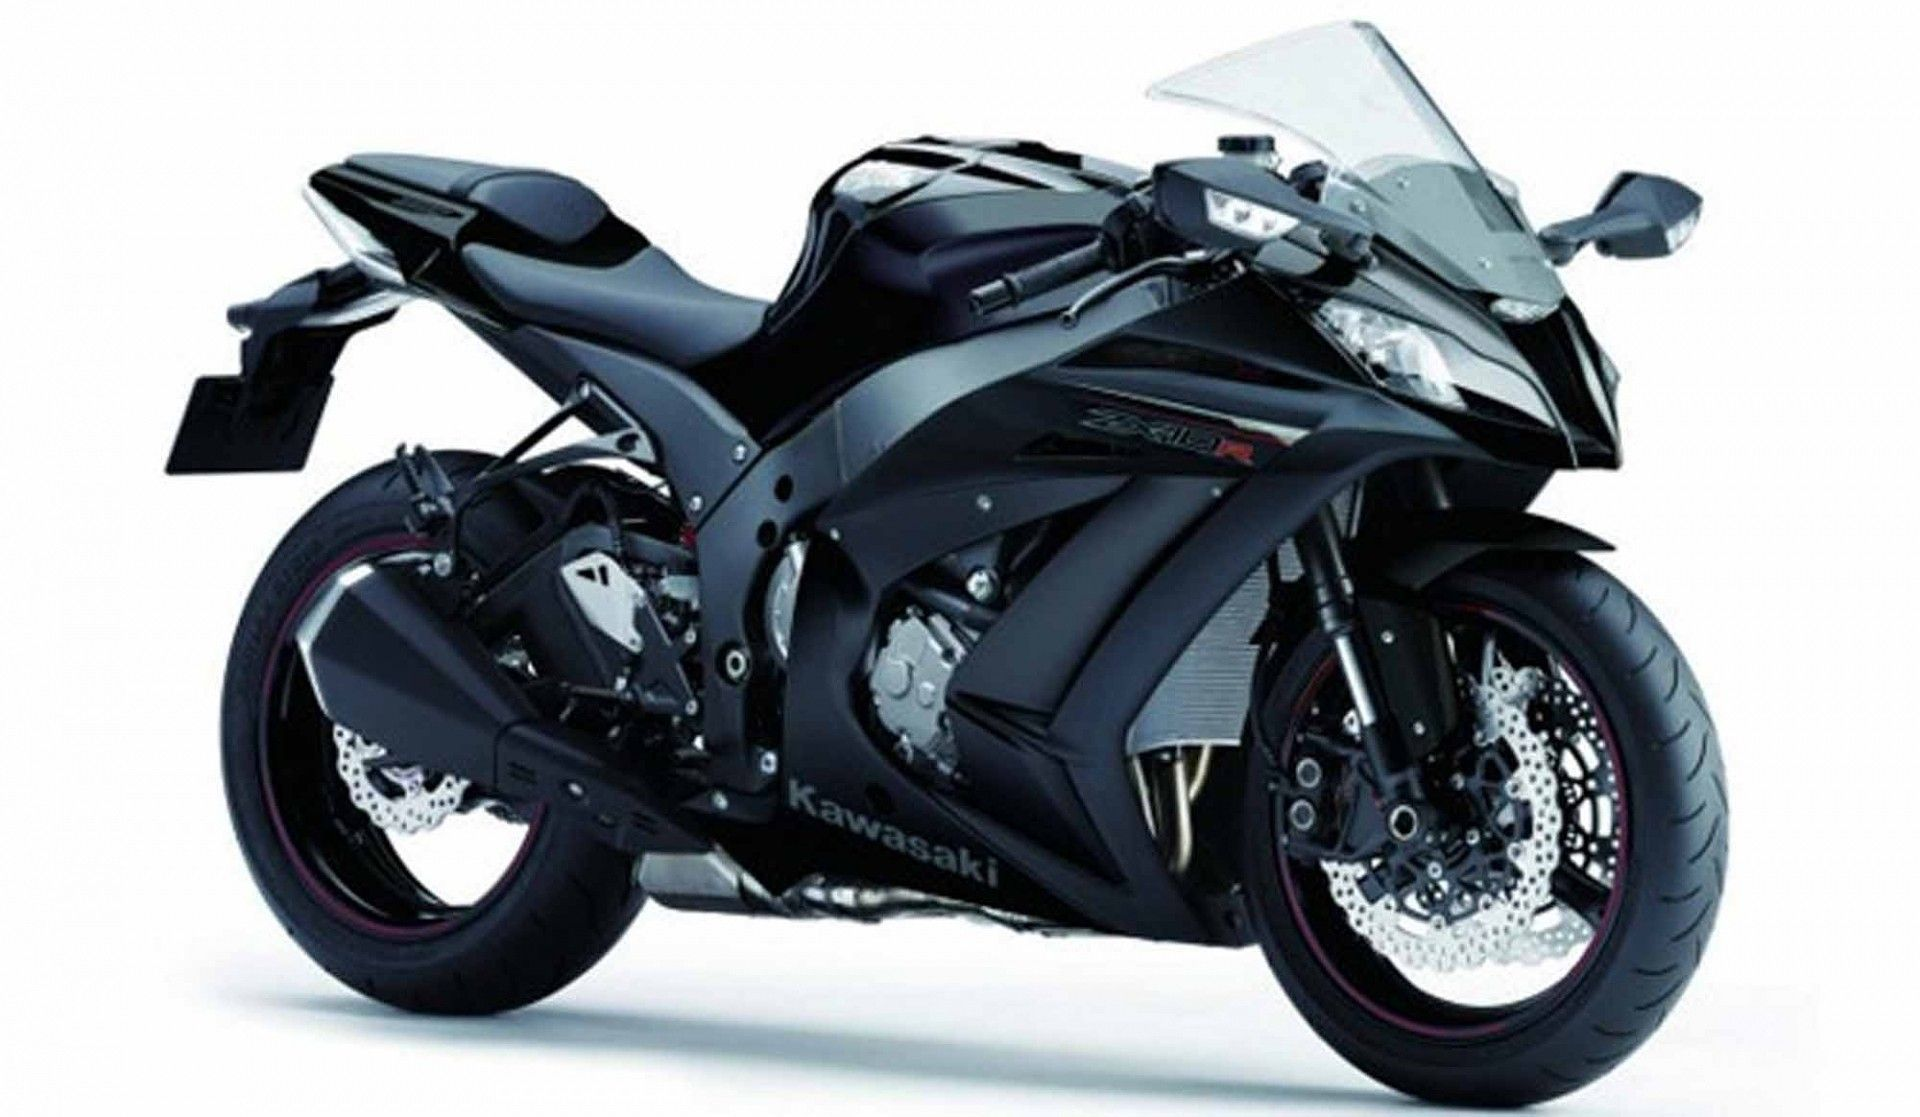 Kawasaki Ninja 250R 2014 Black | Ideas | Pinterest | Kawasaki ninja